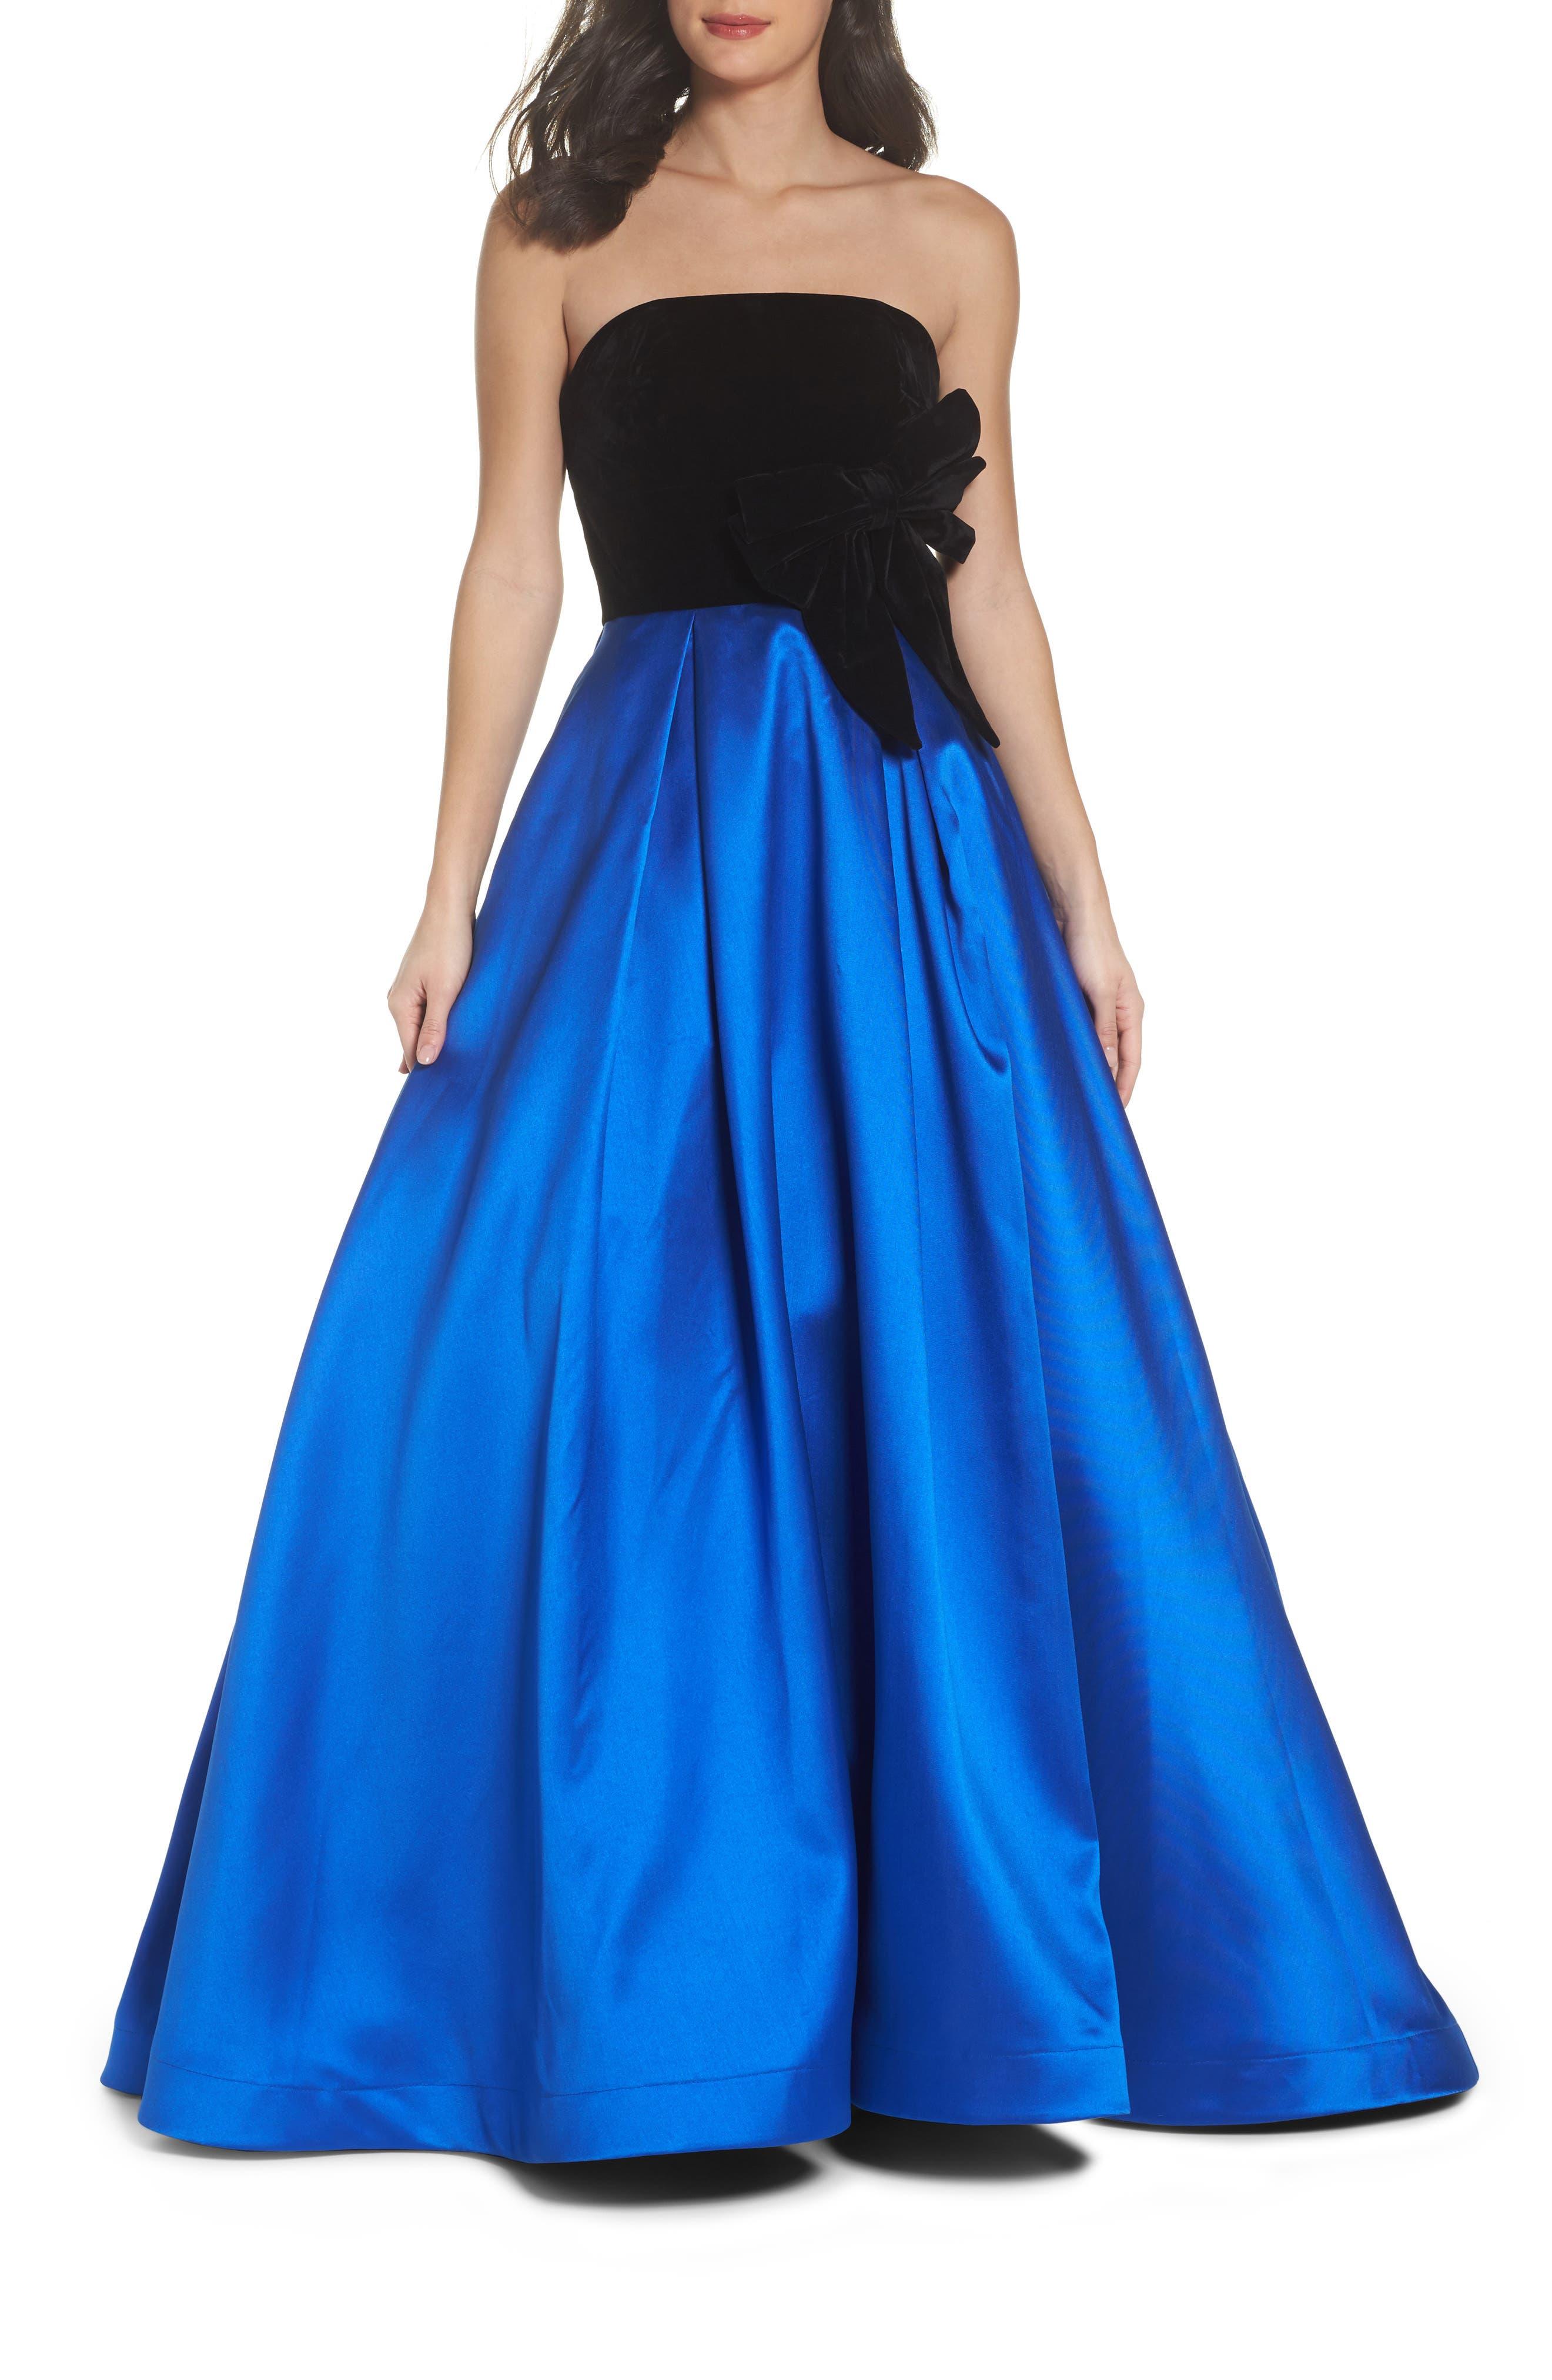 Velvet Bodice Ballgown,                         Main,                         color, Black/Royal